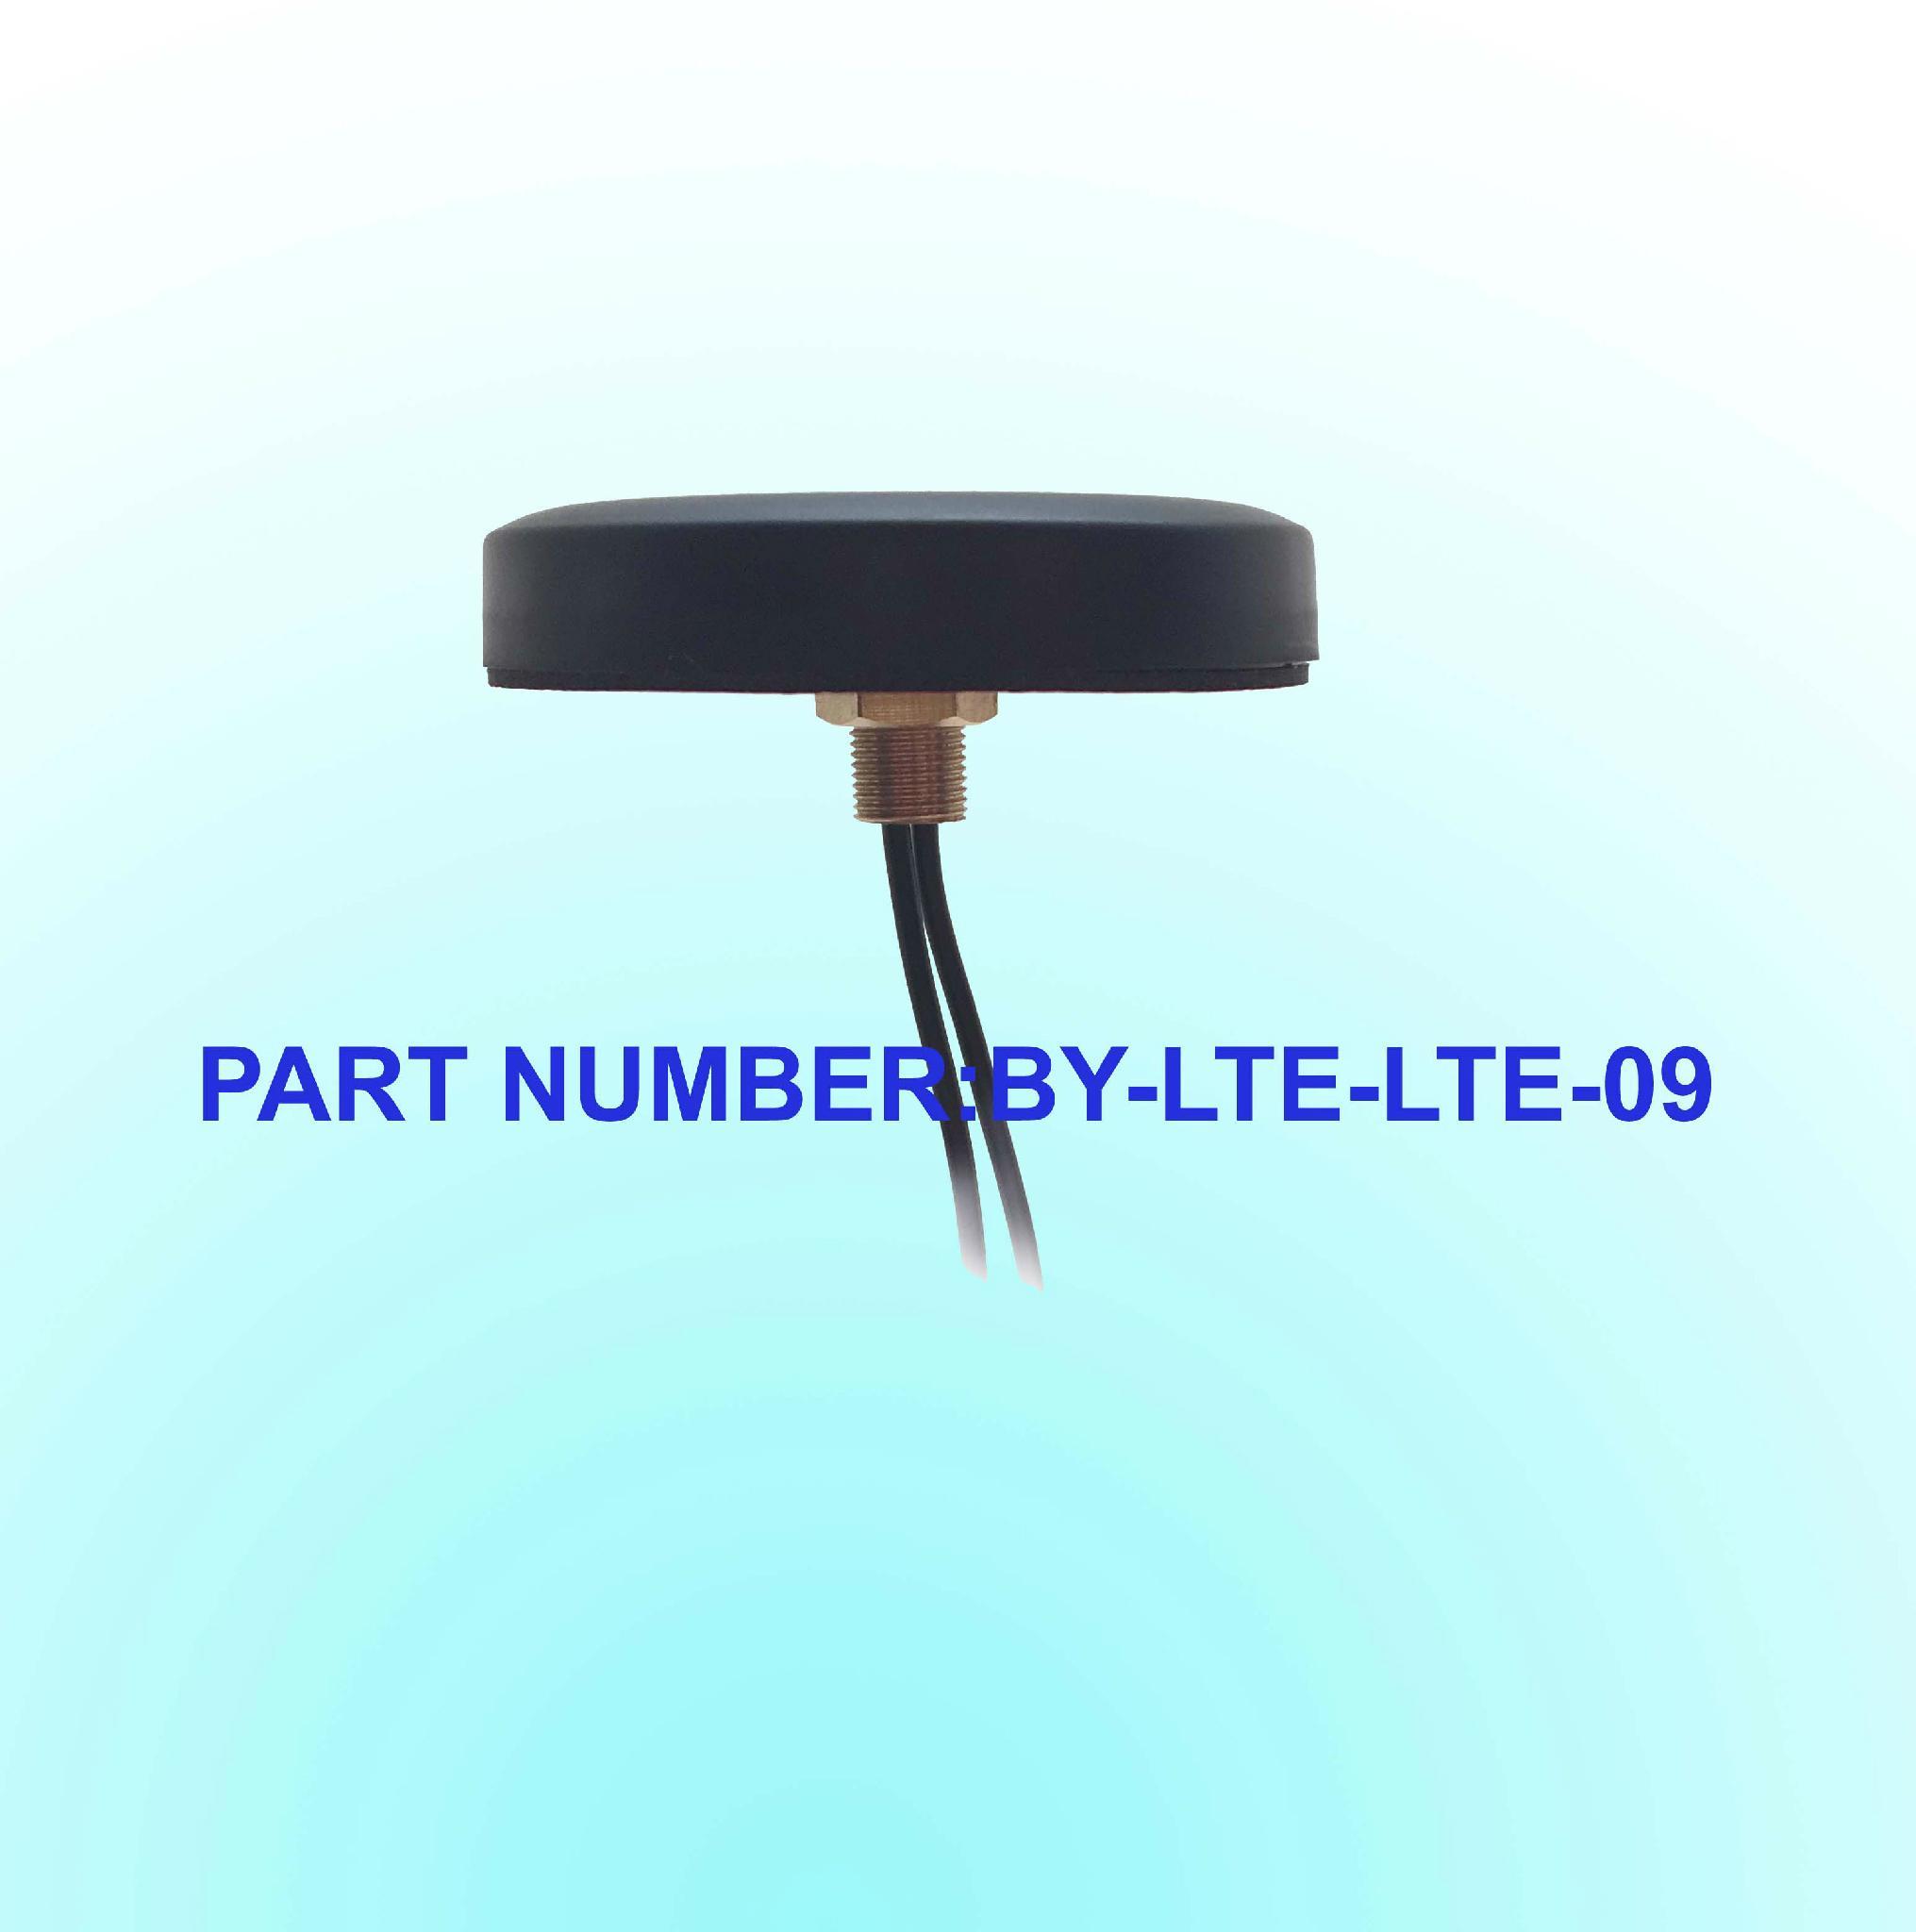 Lte/4G Screw Mounting Antenna